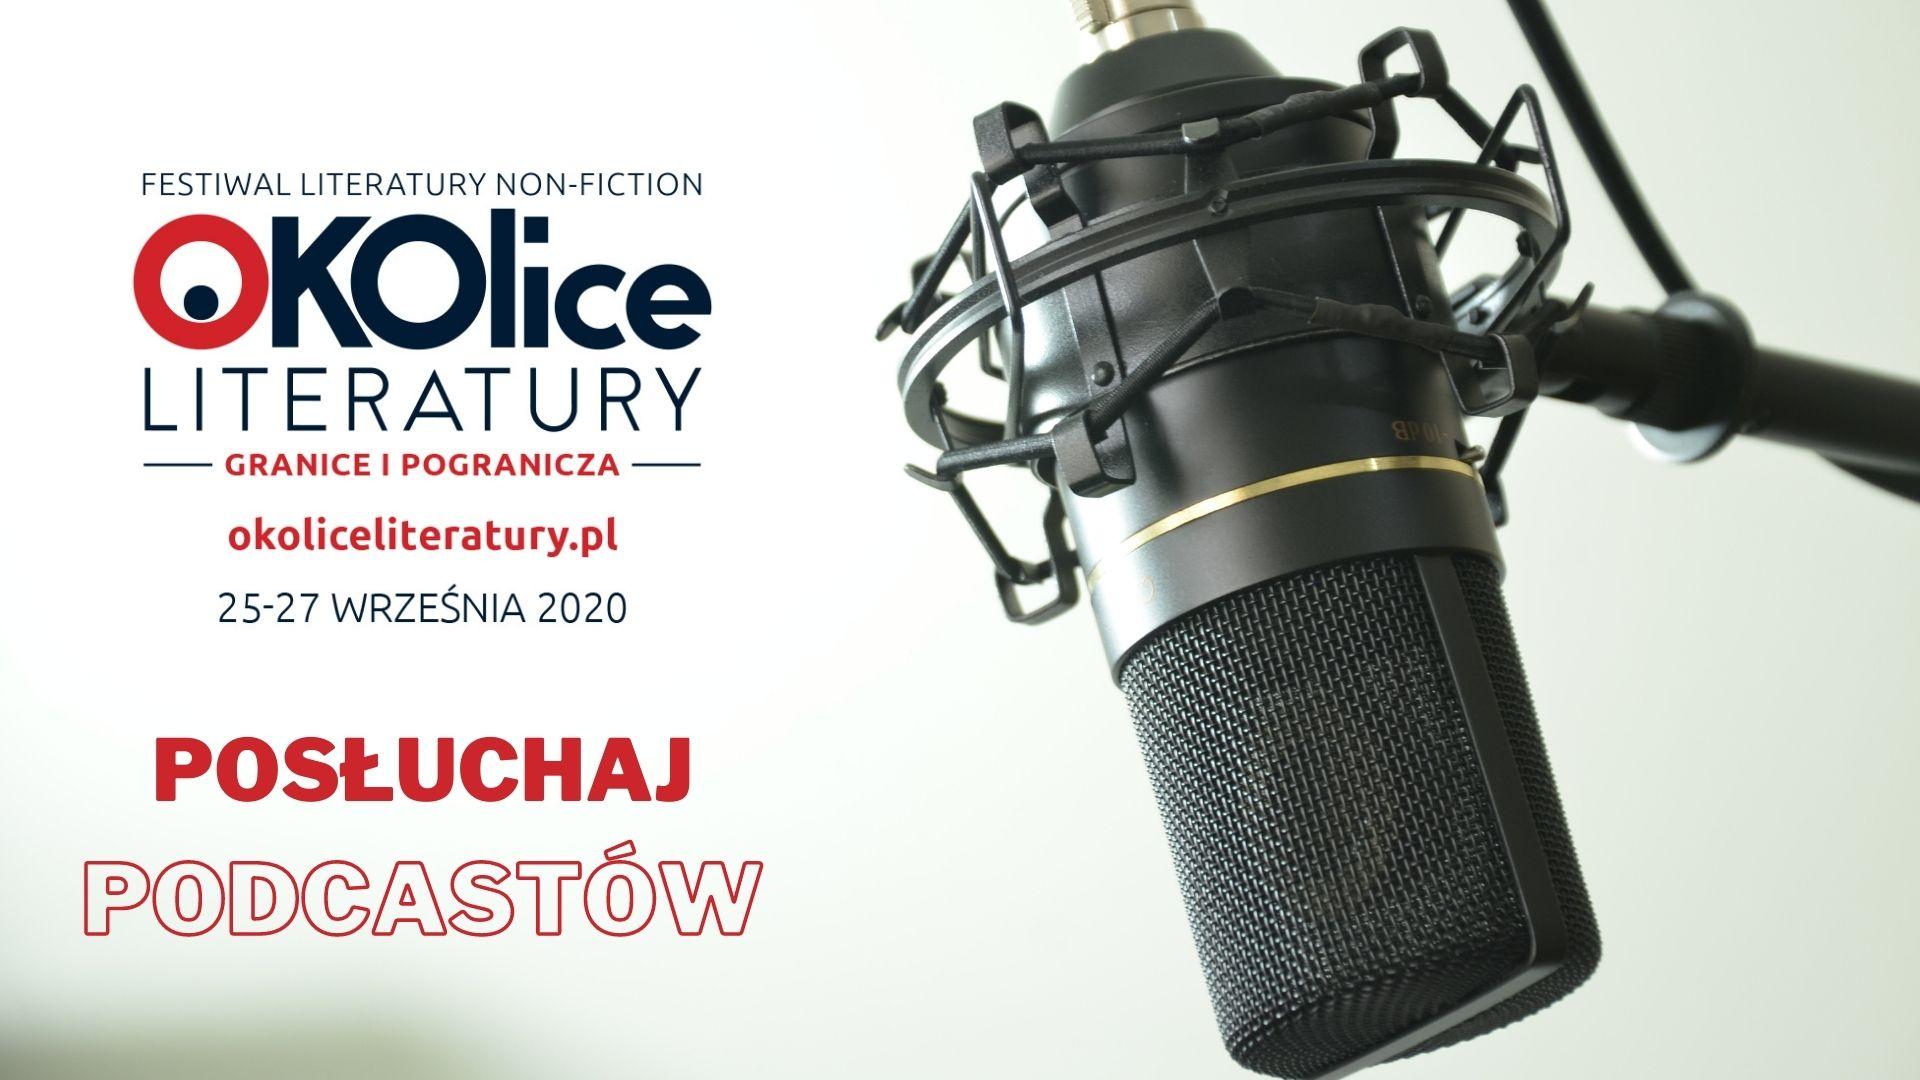 Po festiwalu. Podcasty z OKOlic Literatury